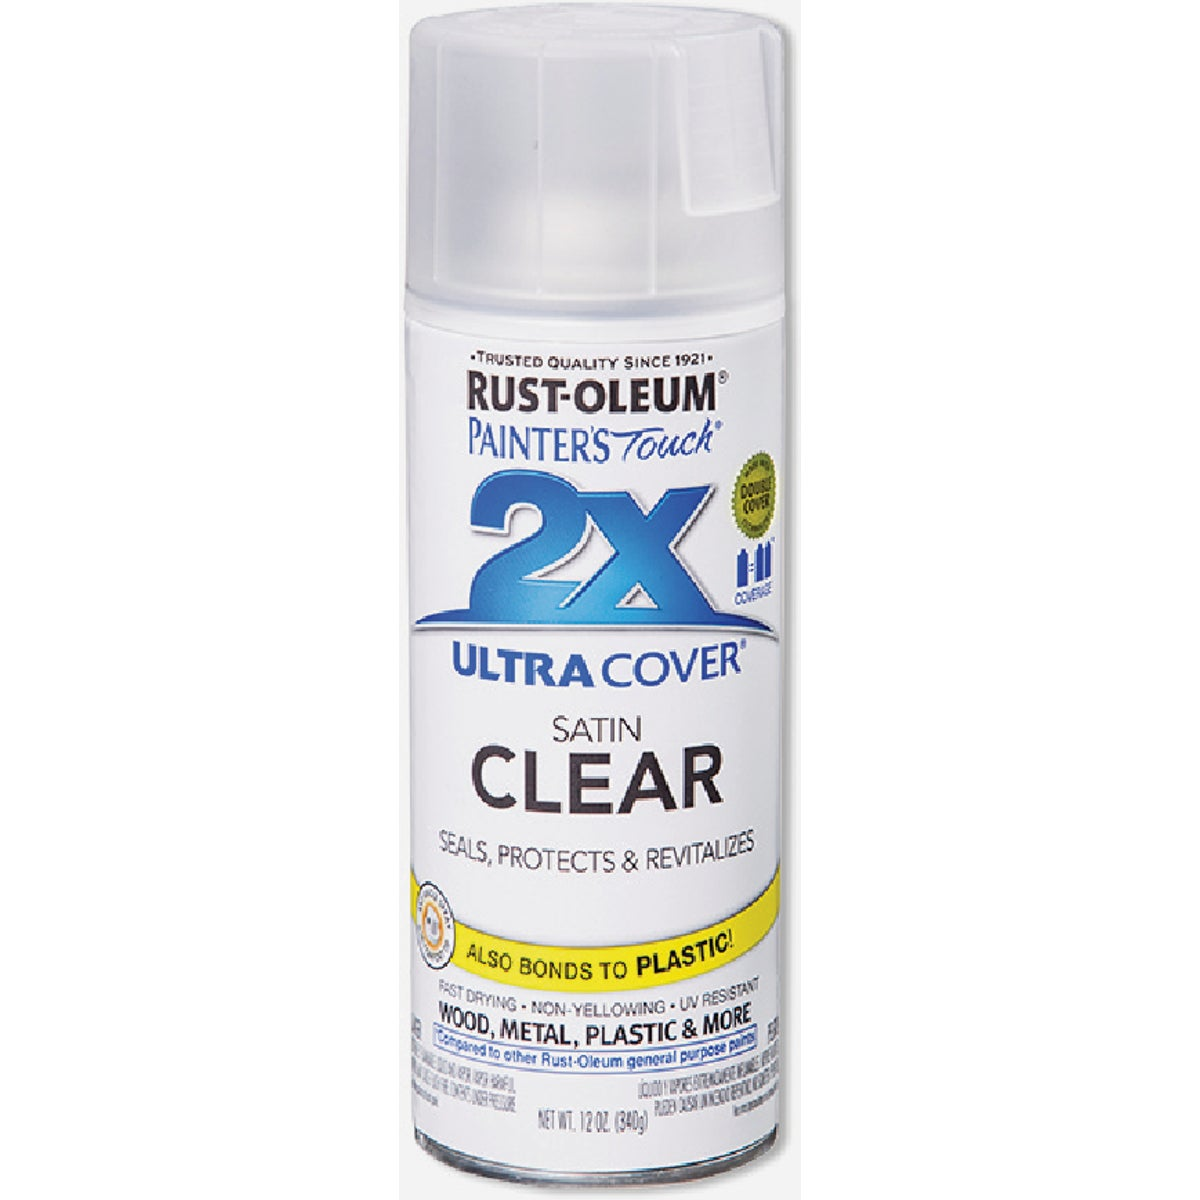 CLEAR SATIN SPRAY PAINT - 249845 by Rustoleum